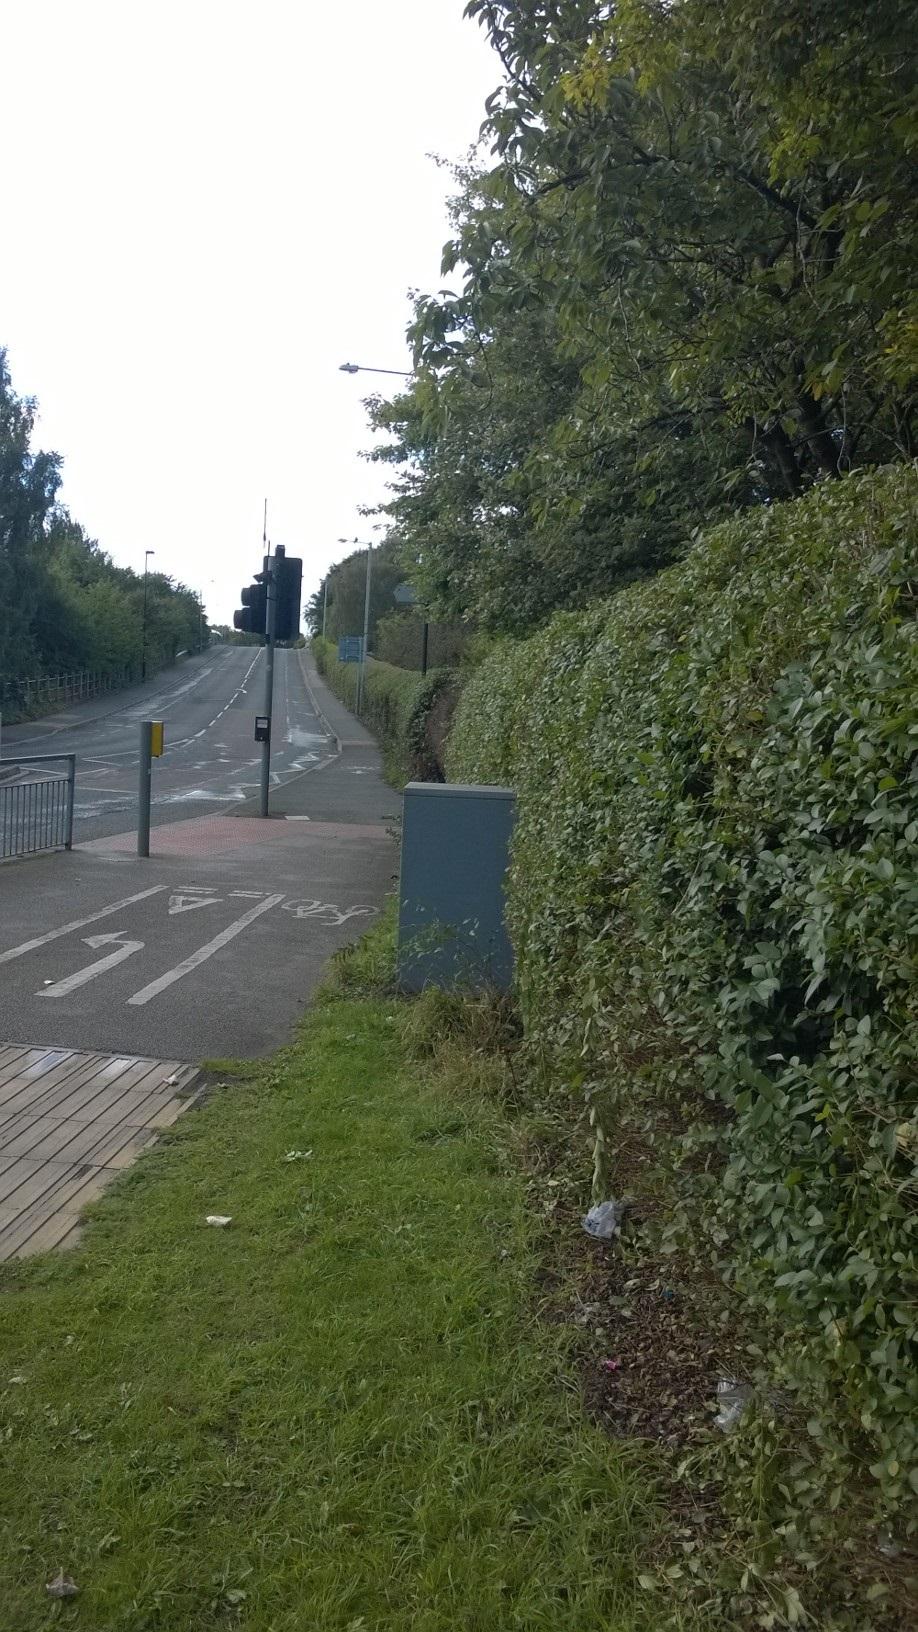 Moor Lane hedge looking trimmer